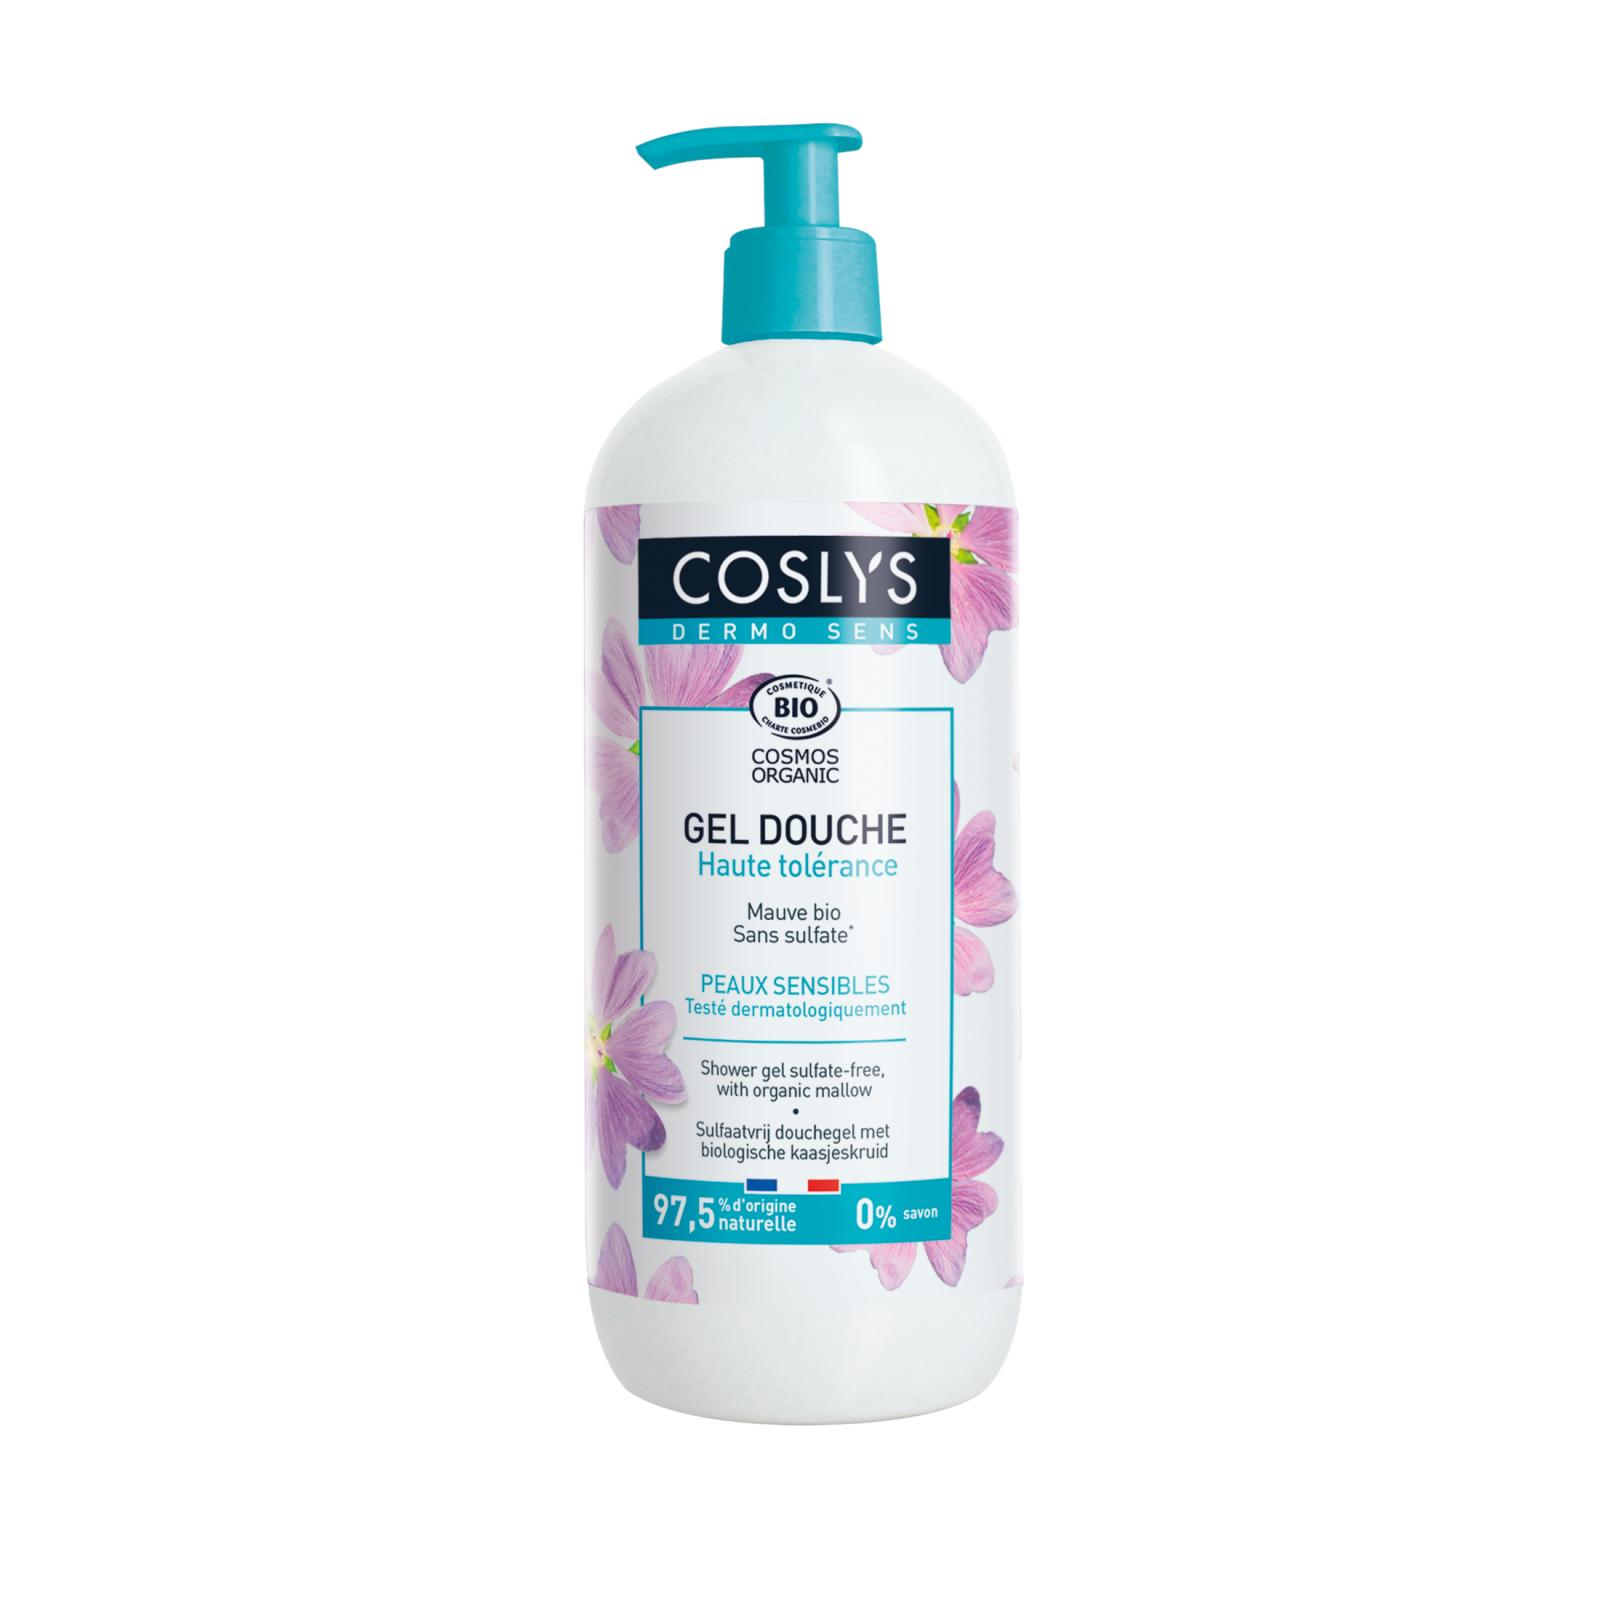 Coslys Sprchový gel bez sulfátů sléz 950 ml